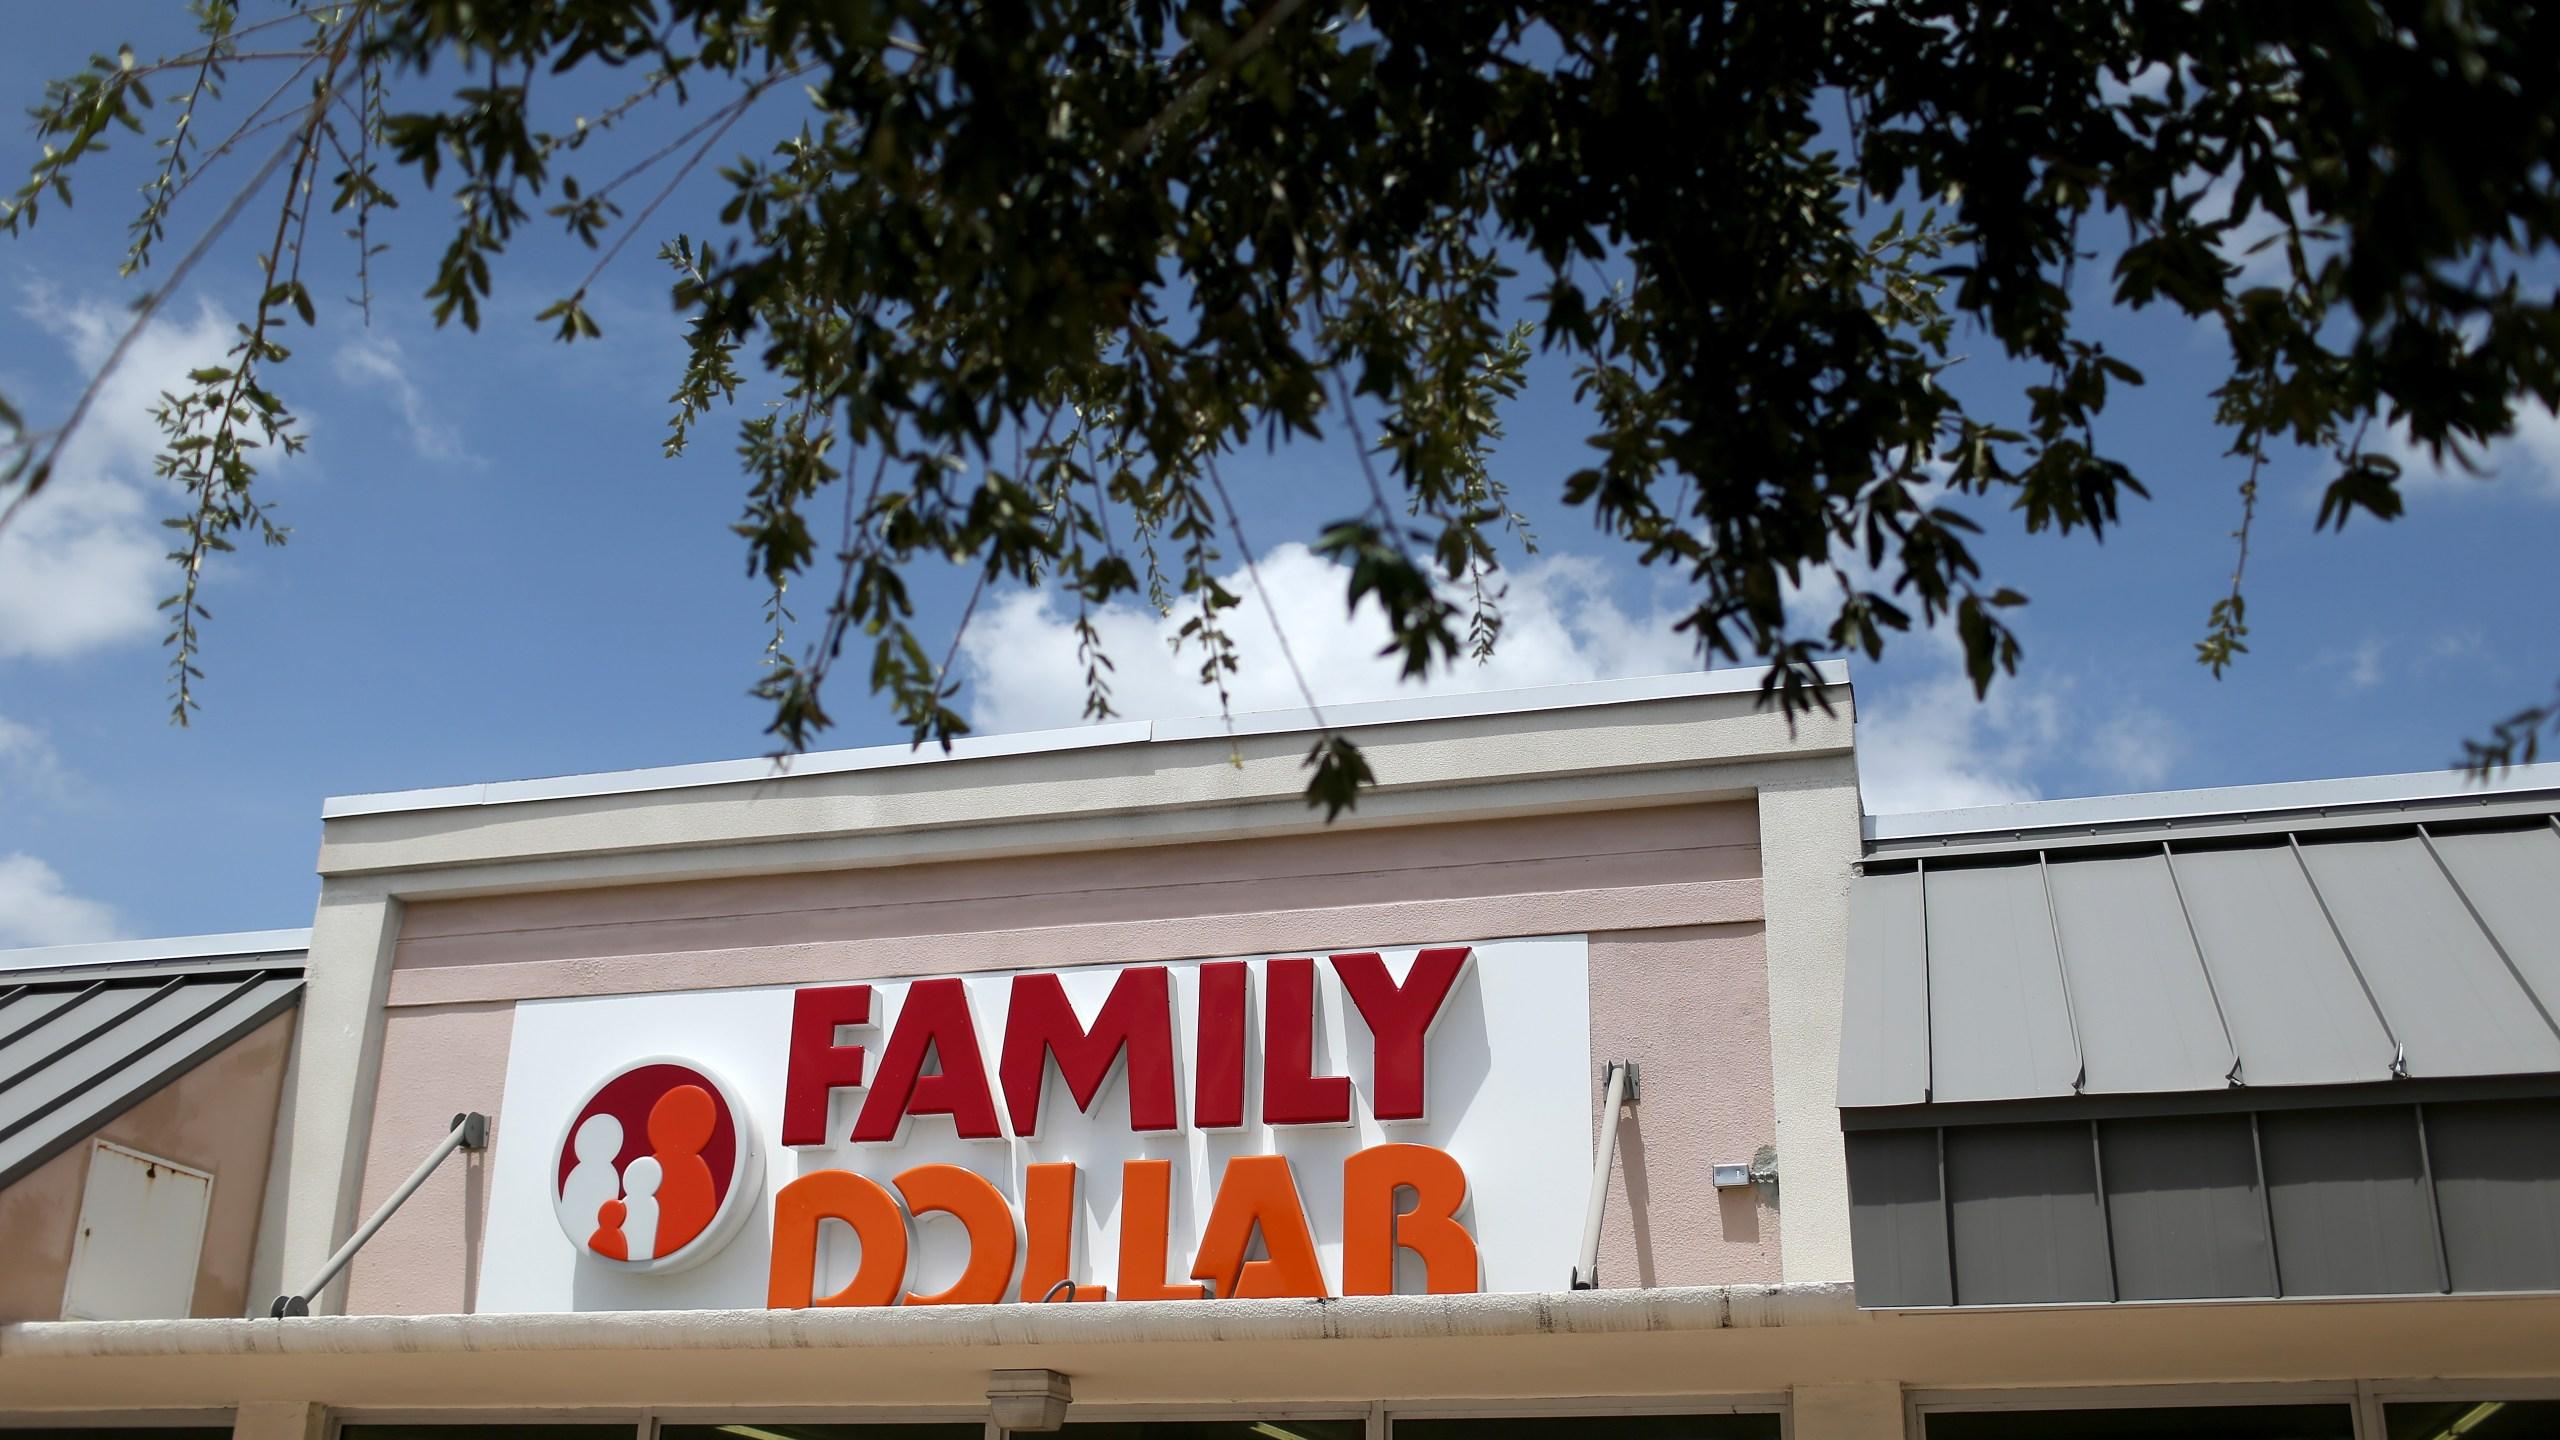 Family Dollar_1551881944471